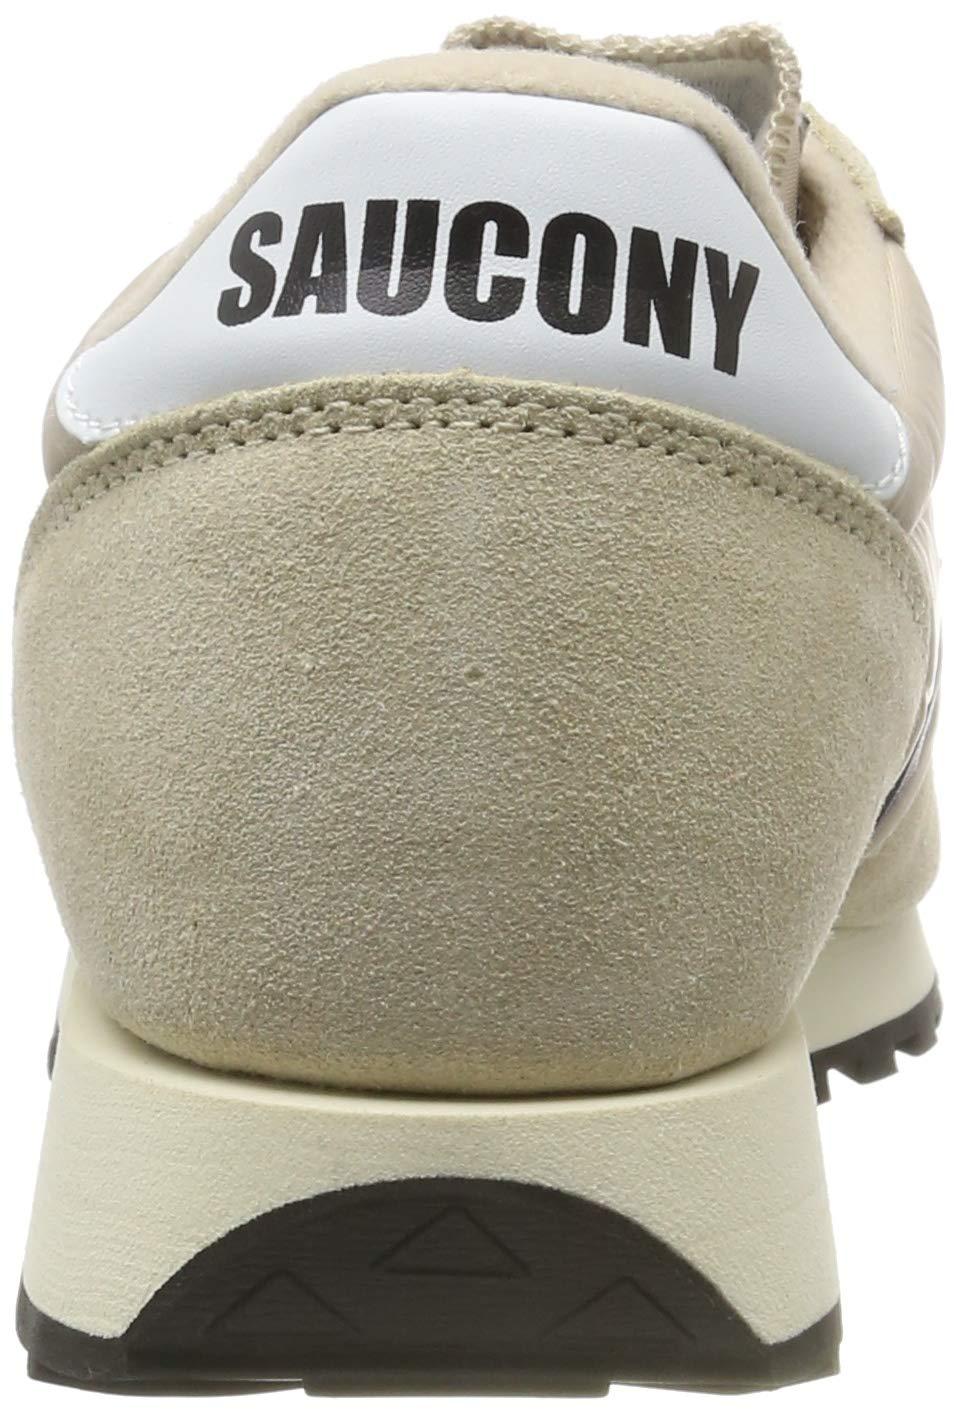 Saucony Jazz Original Vintage, Scarpe da Ginnastica Basse Uomo 13 spesavip